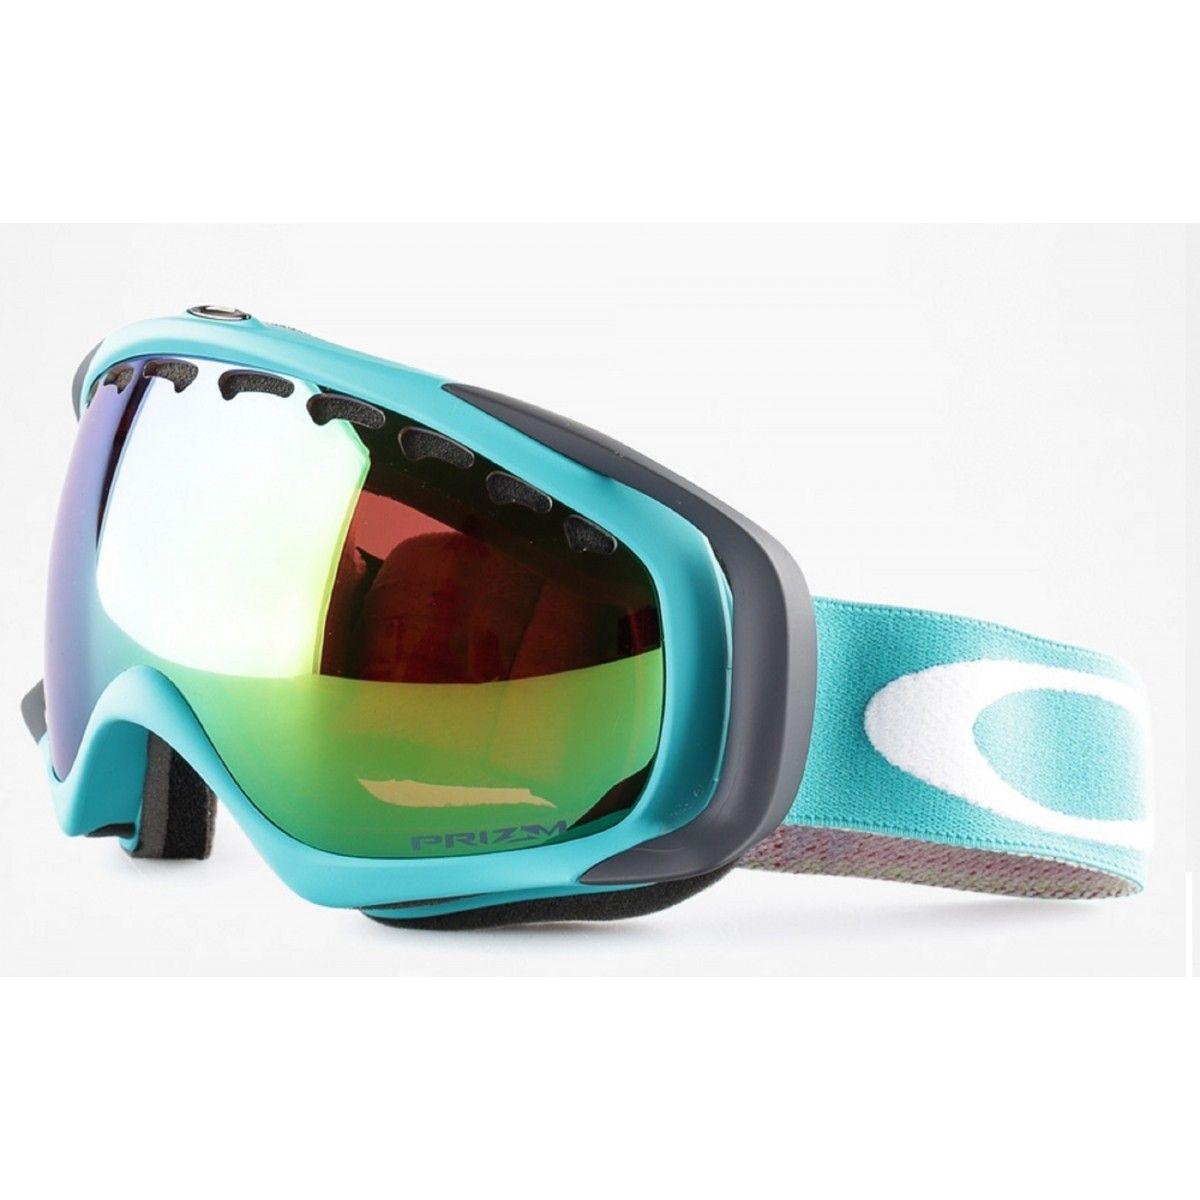 snowboarding oakley goggles  Oakley Crowbar Ski Snowboard Goggles from @Golfskipin